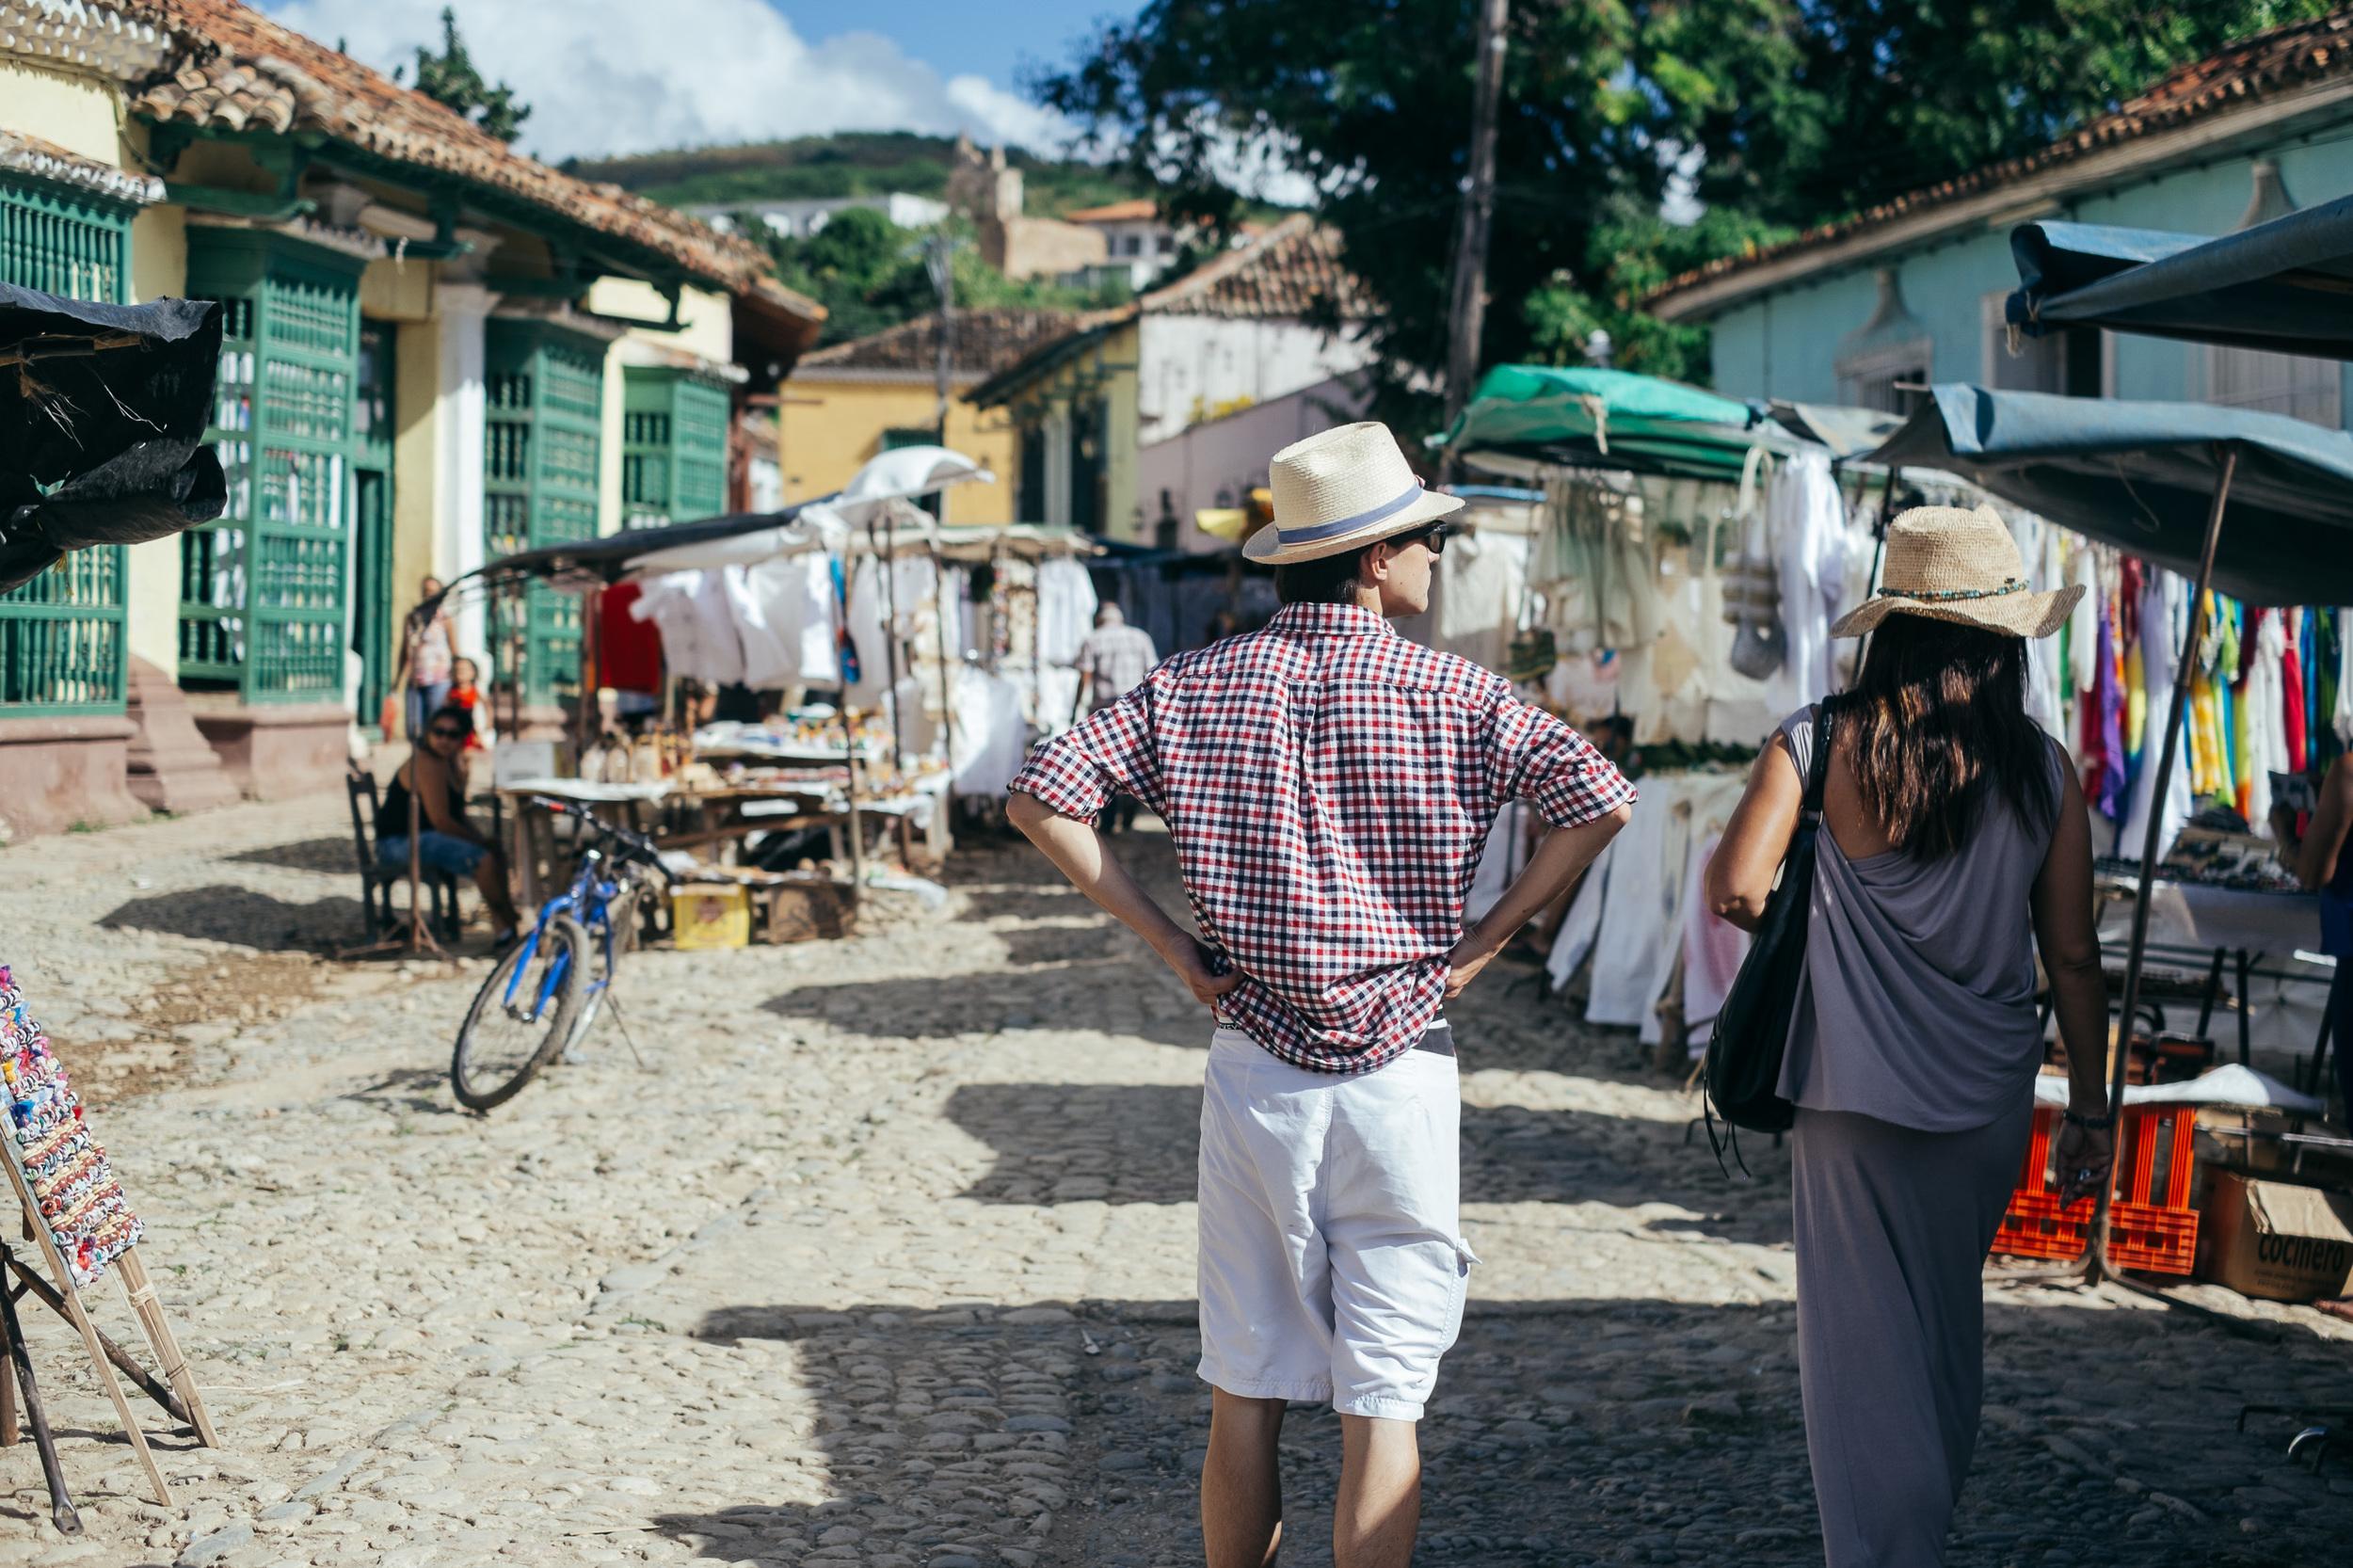 DeClaro-Photography-Cuba-0435.jpg